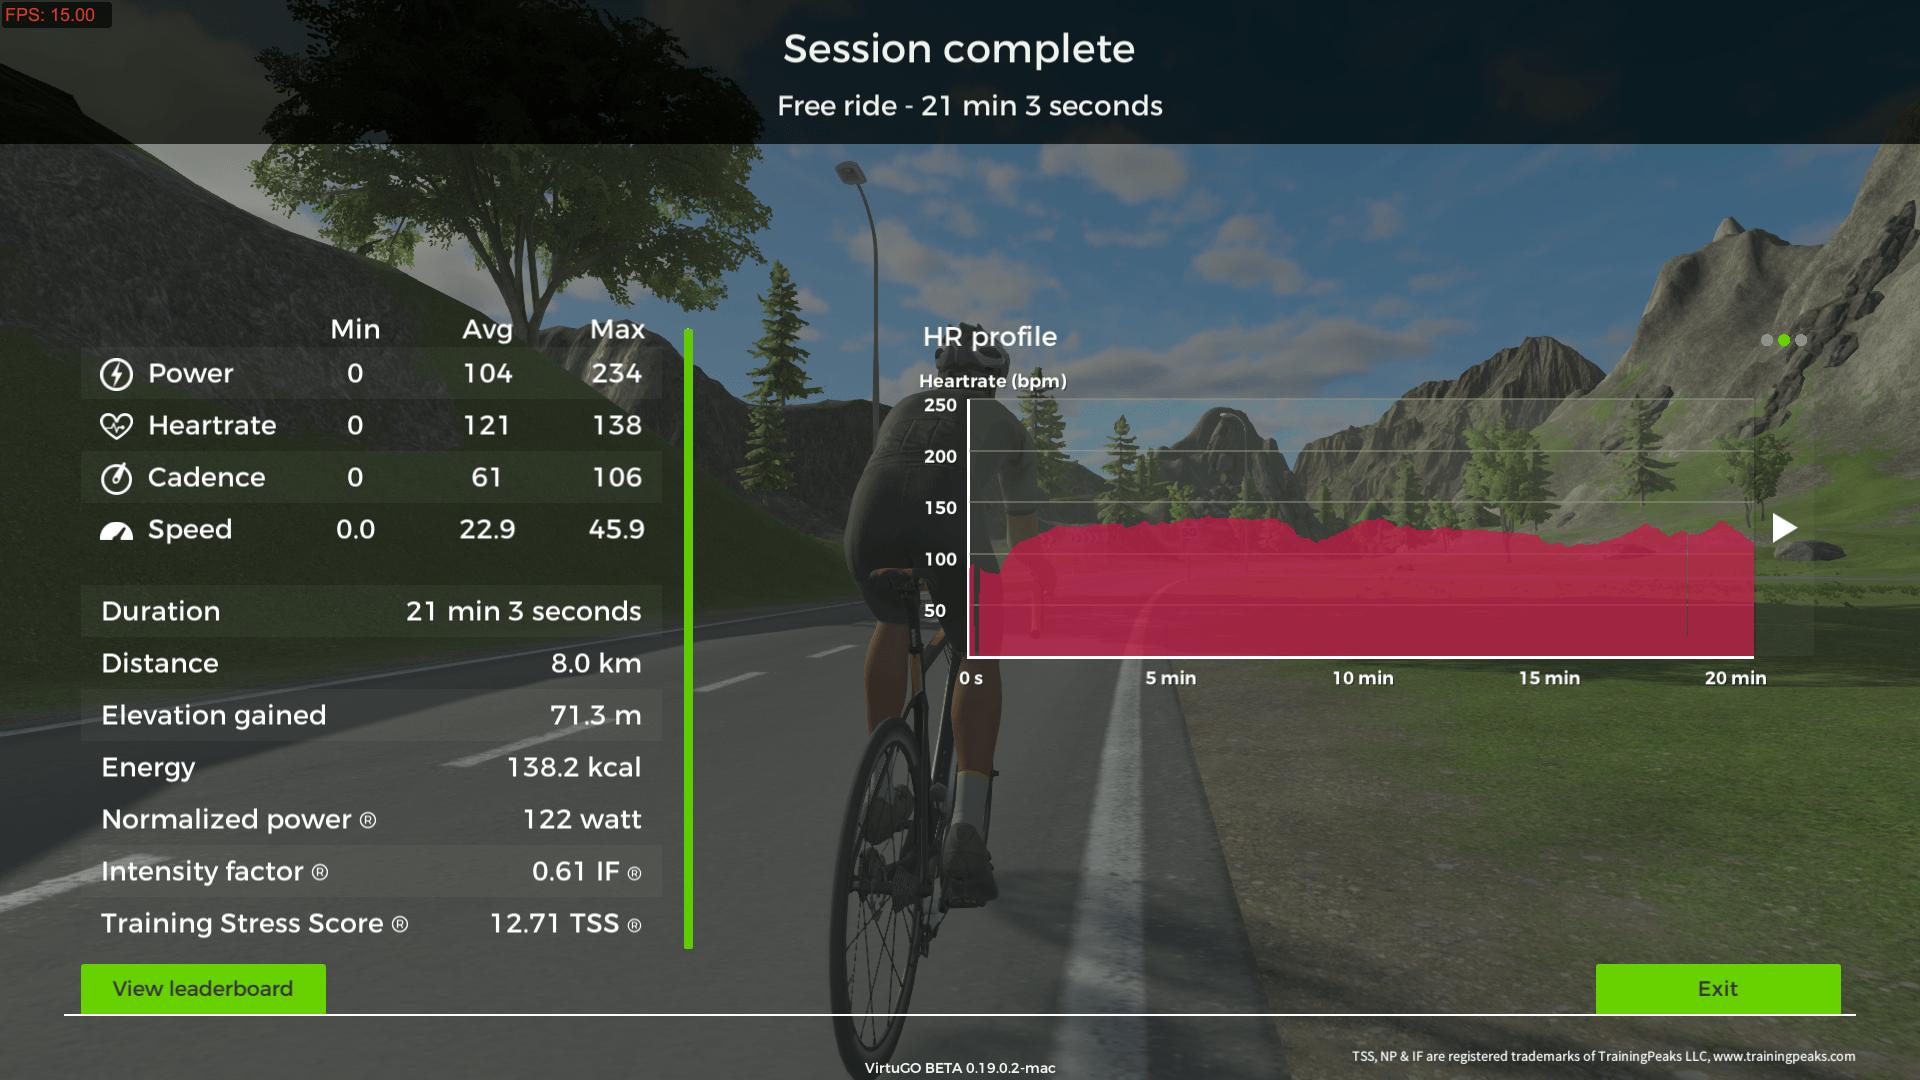 VirtuGO Beta - Free ride session completion statistics (Heart Rate Profile)